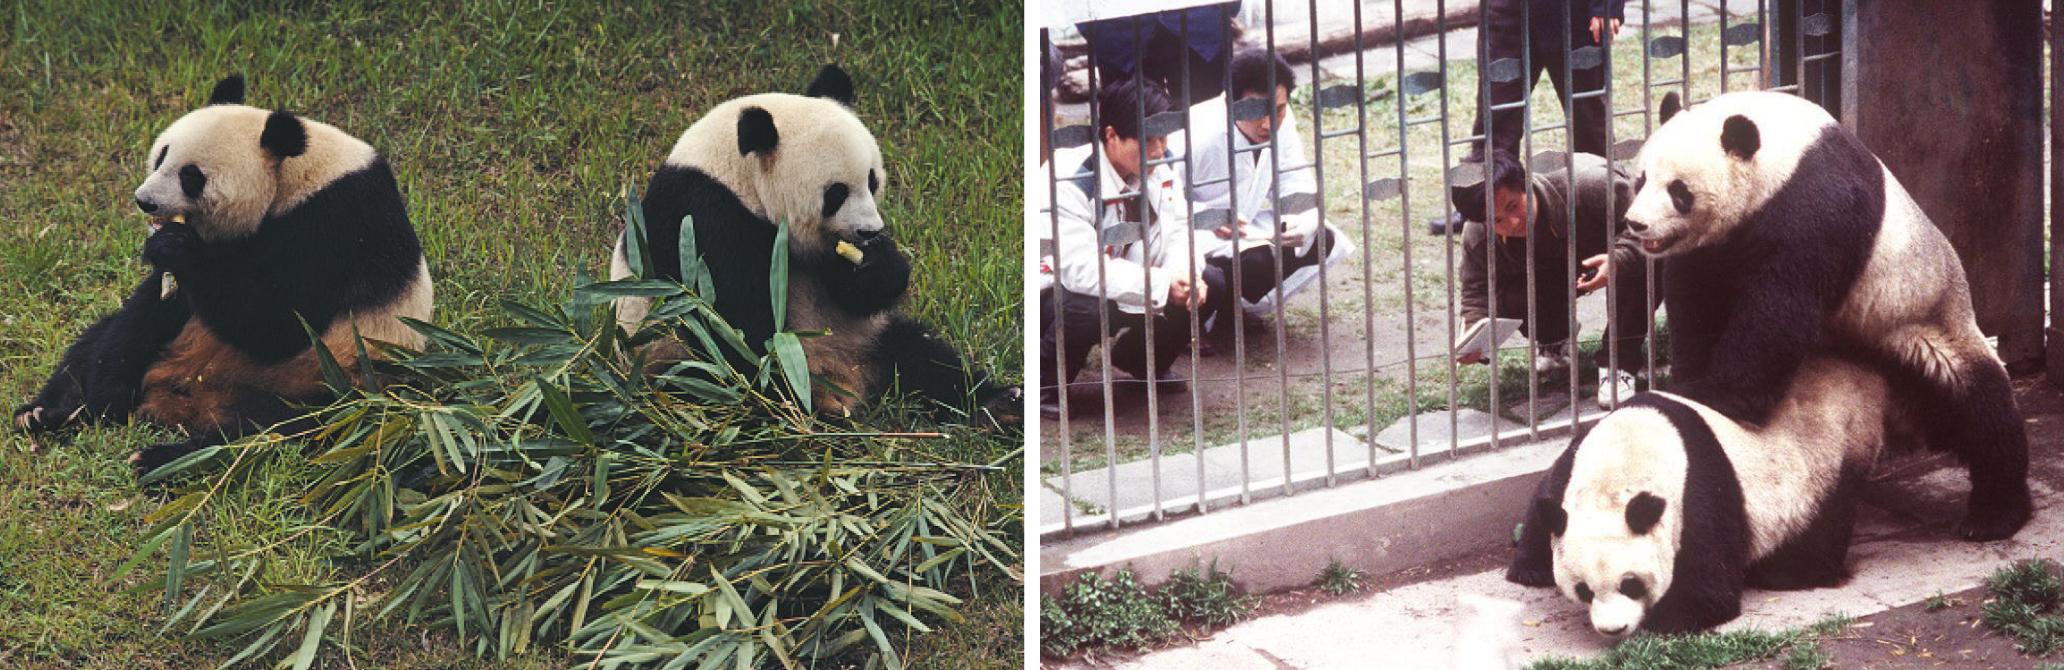 Sperm harvesting panda galleries 384